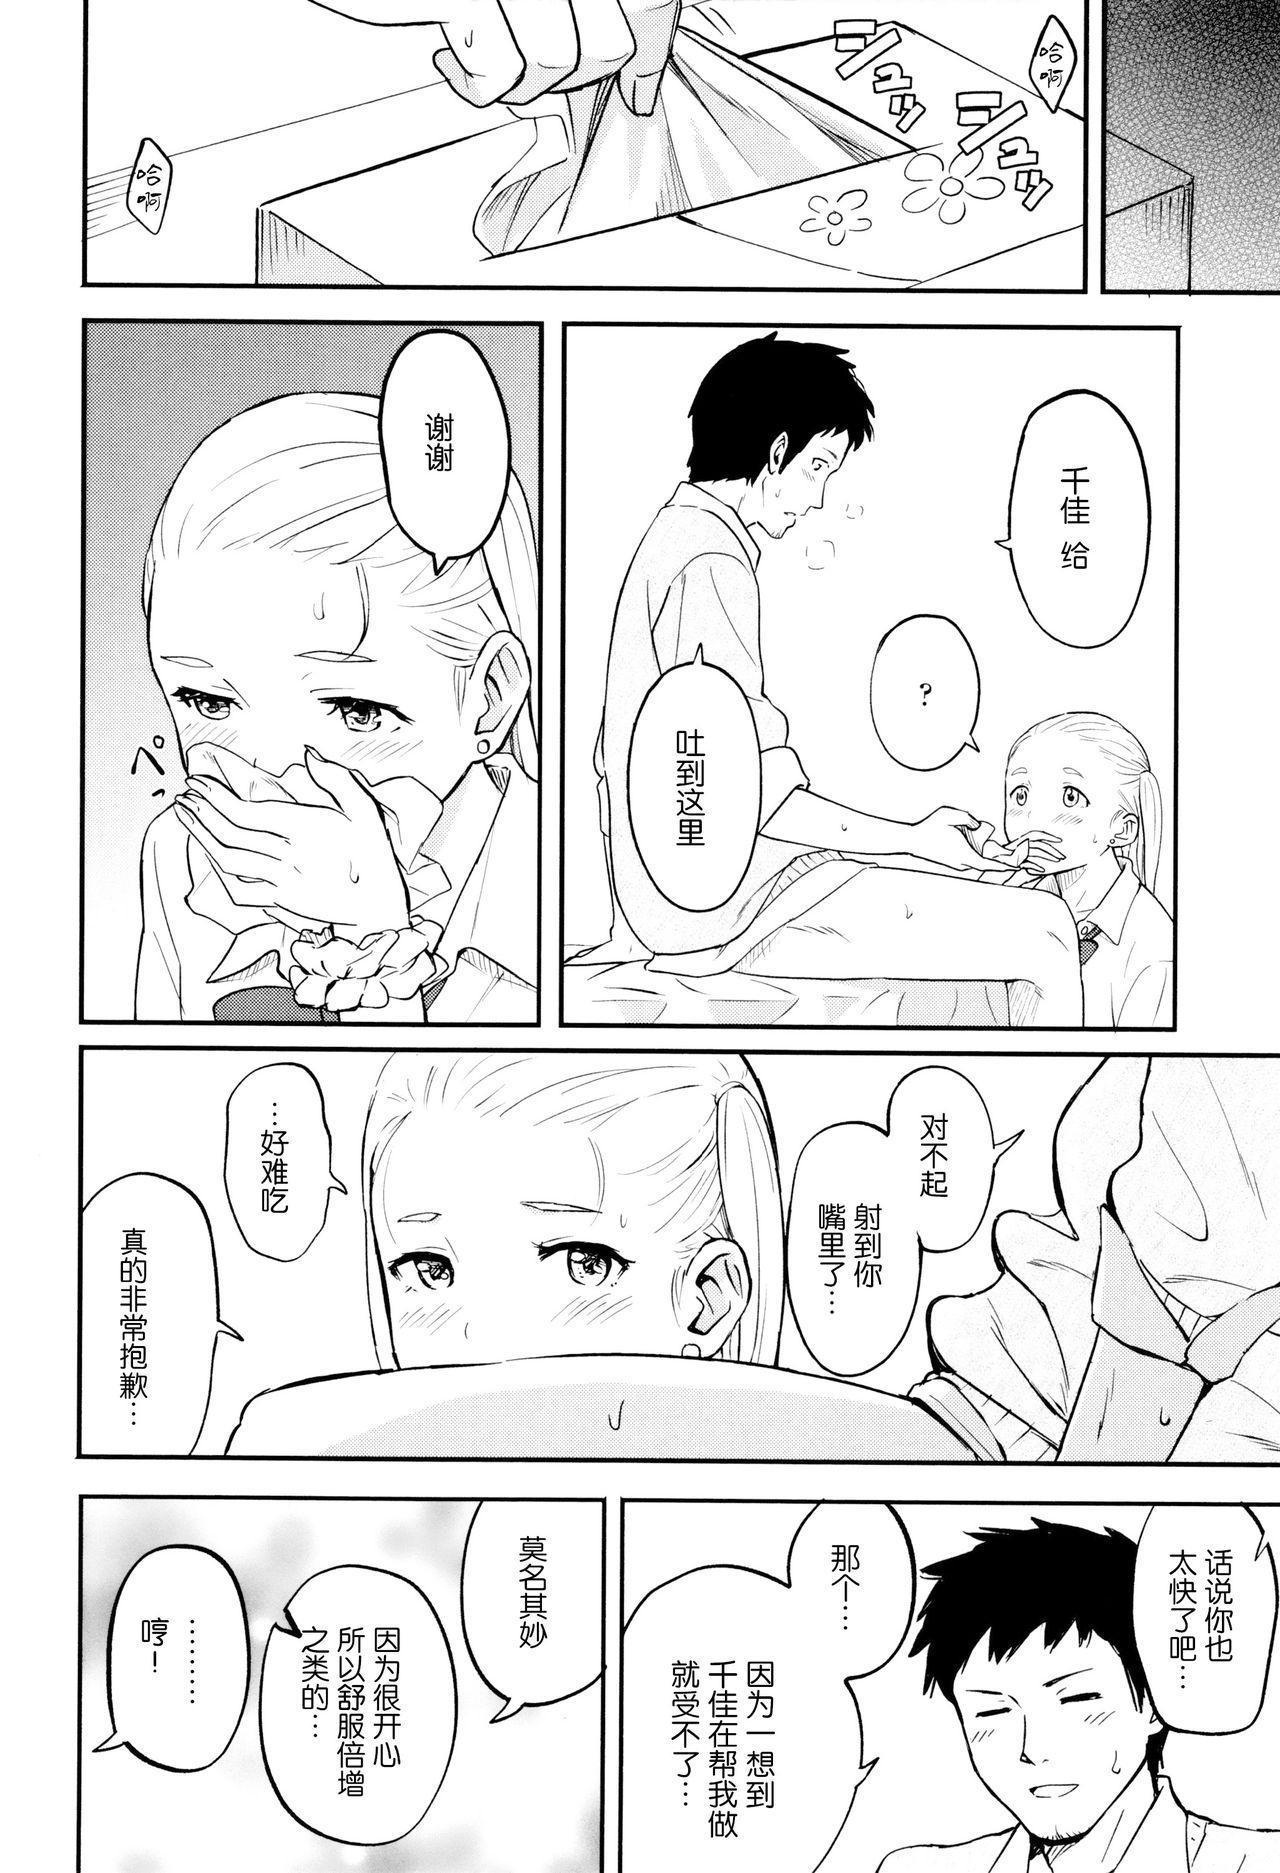 Tokubetsu na Mainichi - Special daily 76